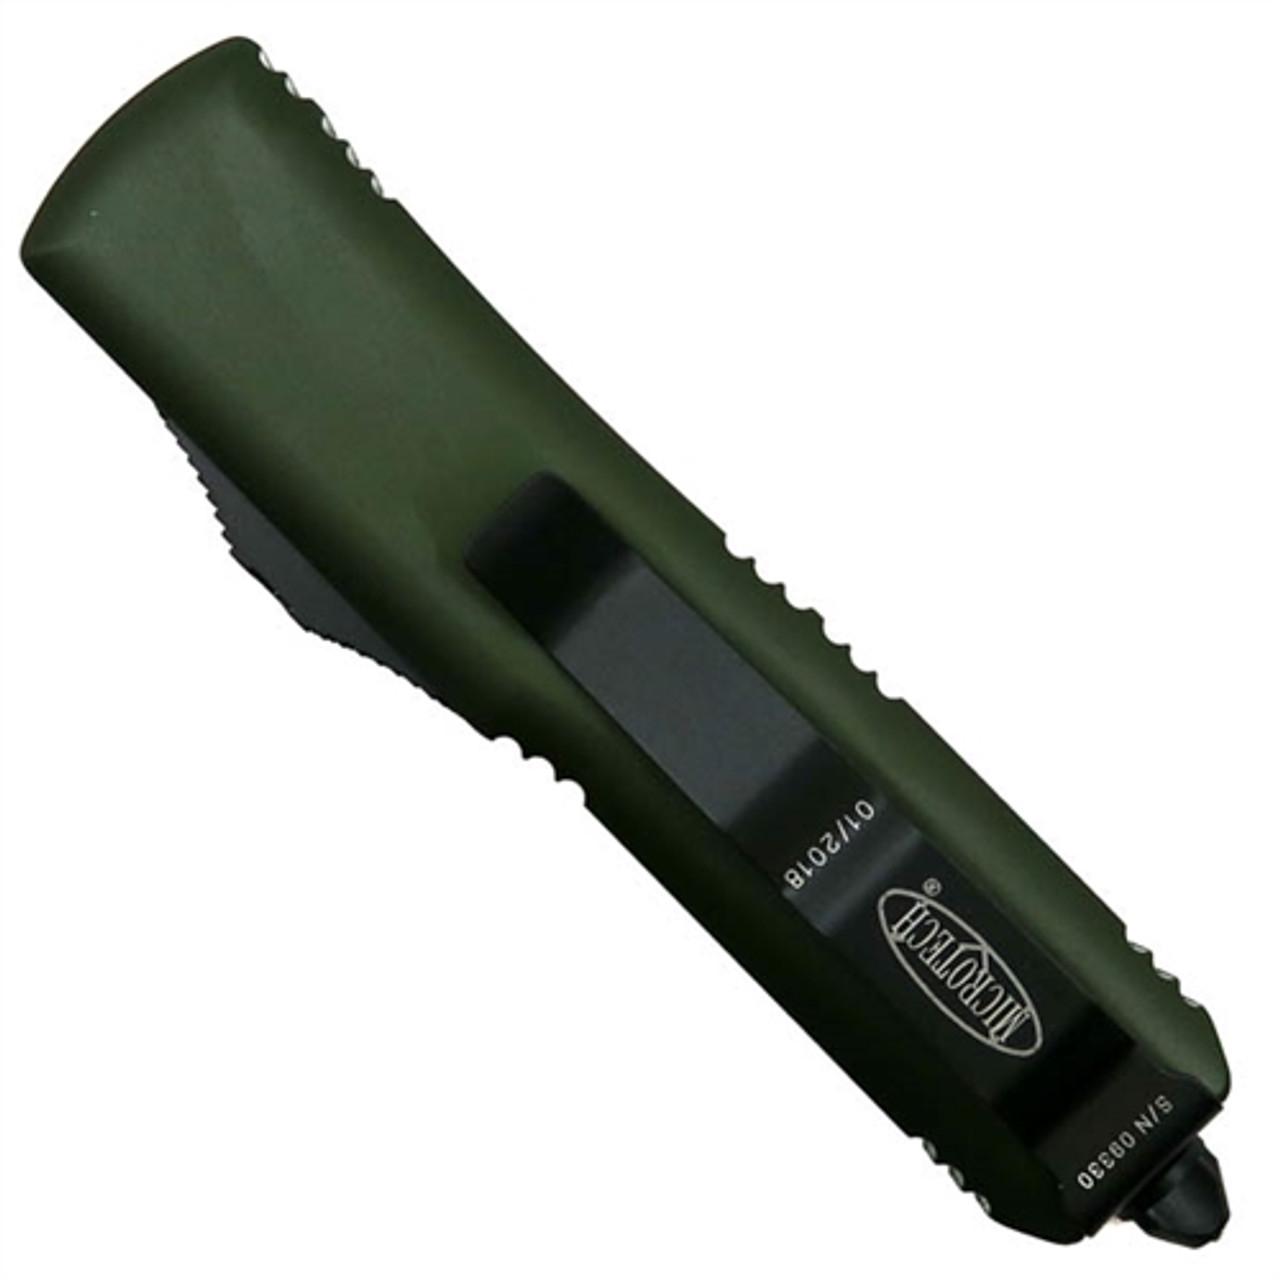 Microtech 233-1OD OD Green Contoured UTX-85 T/E OTF Auto Knife, Black Blade REAR VIEW